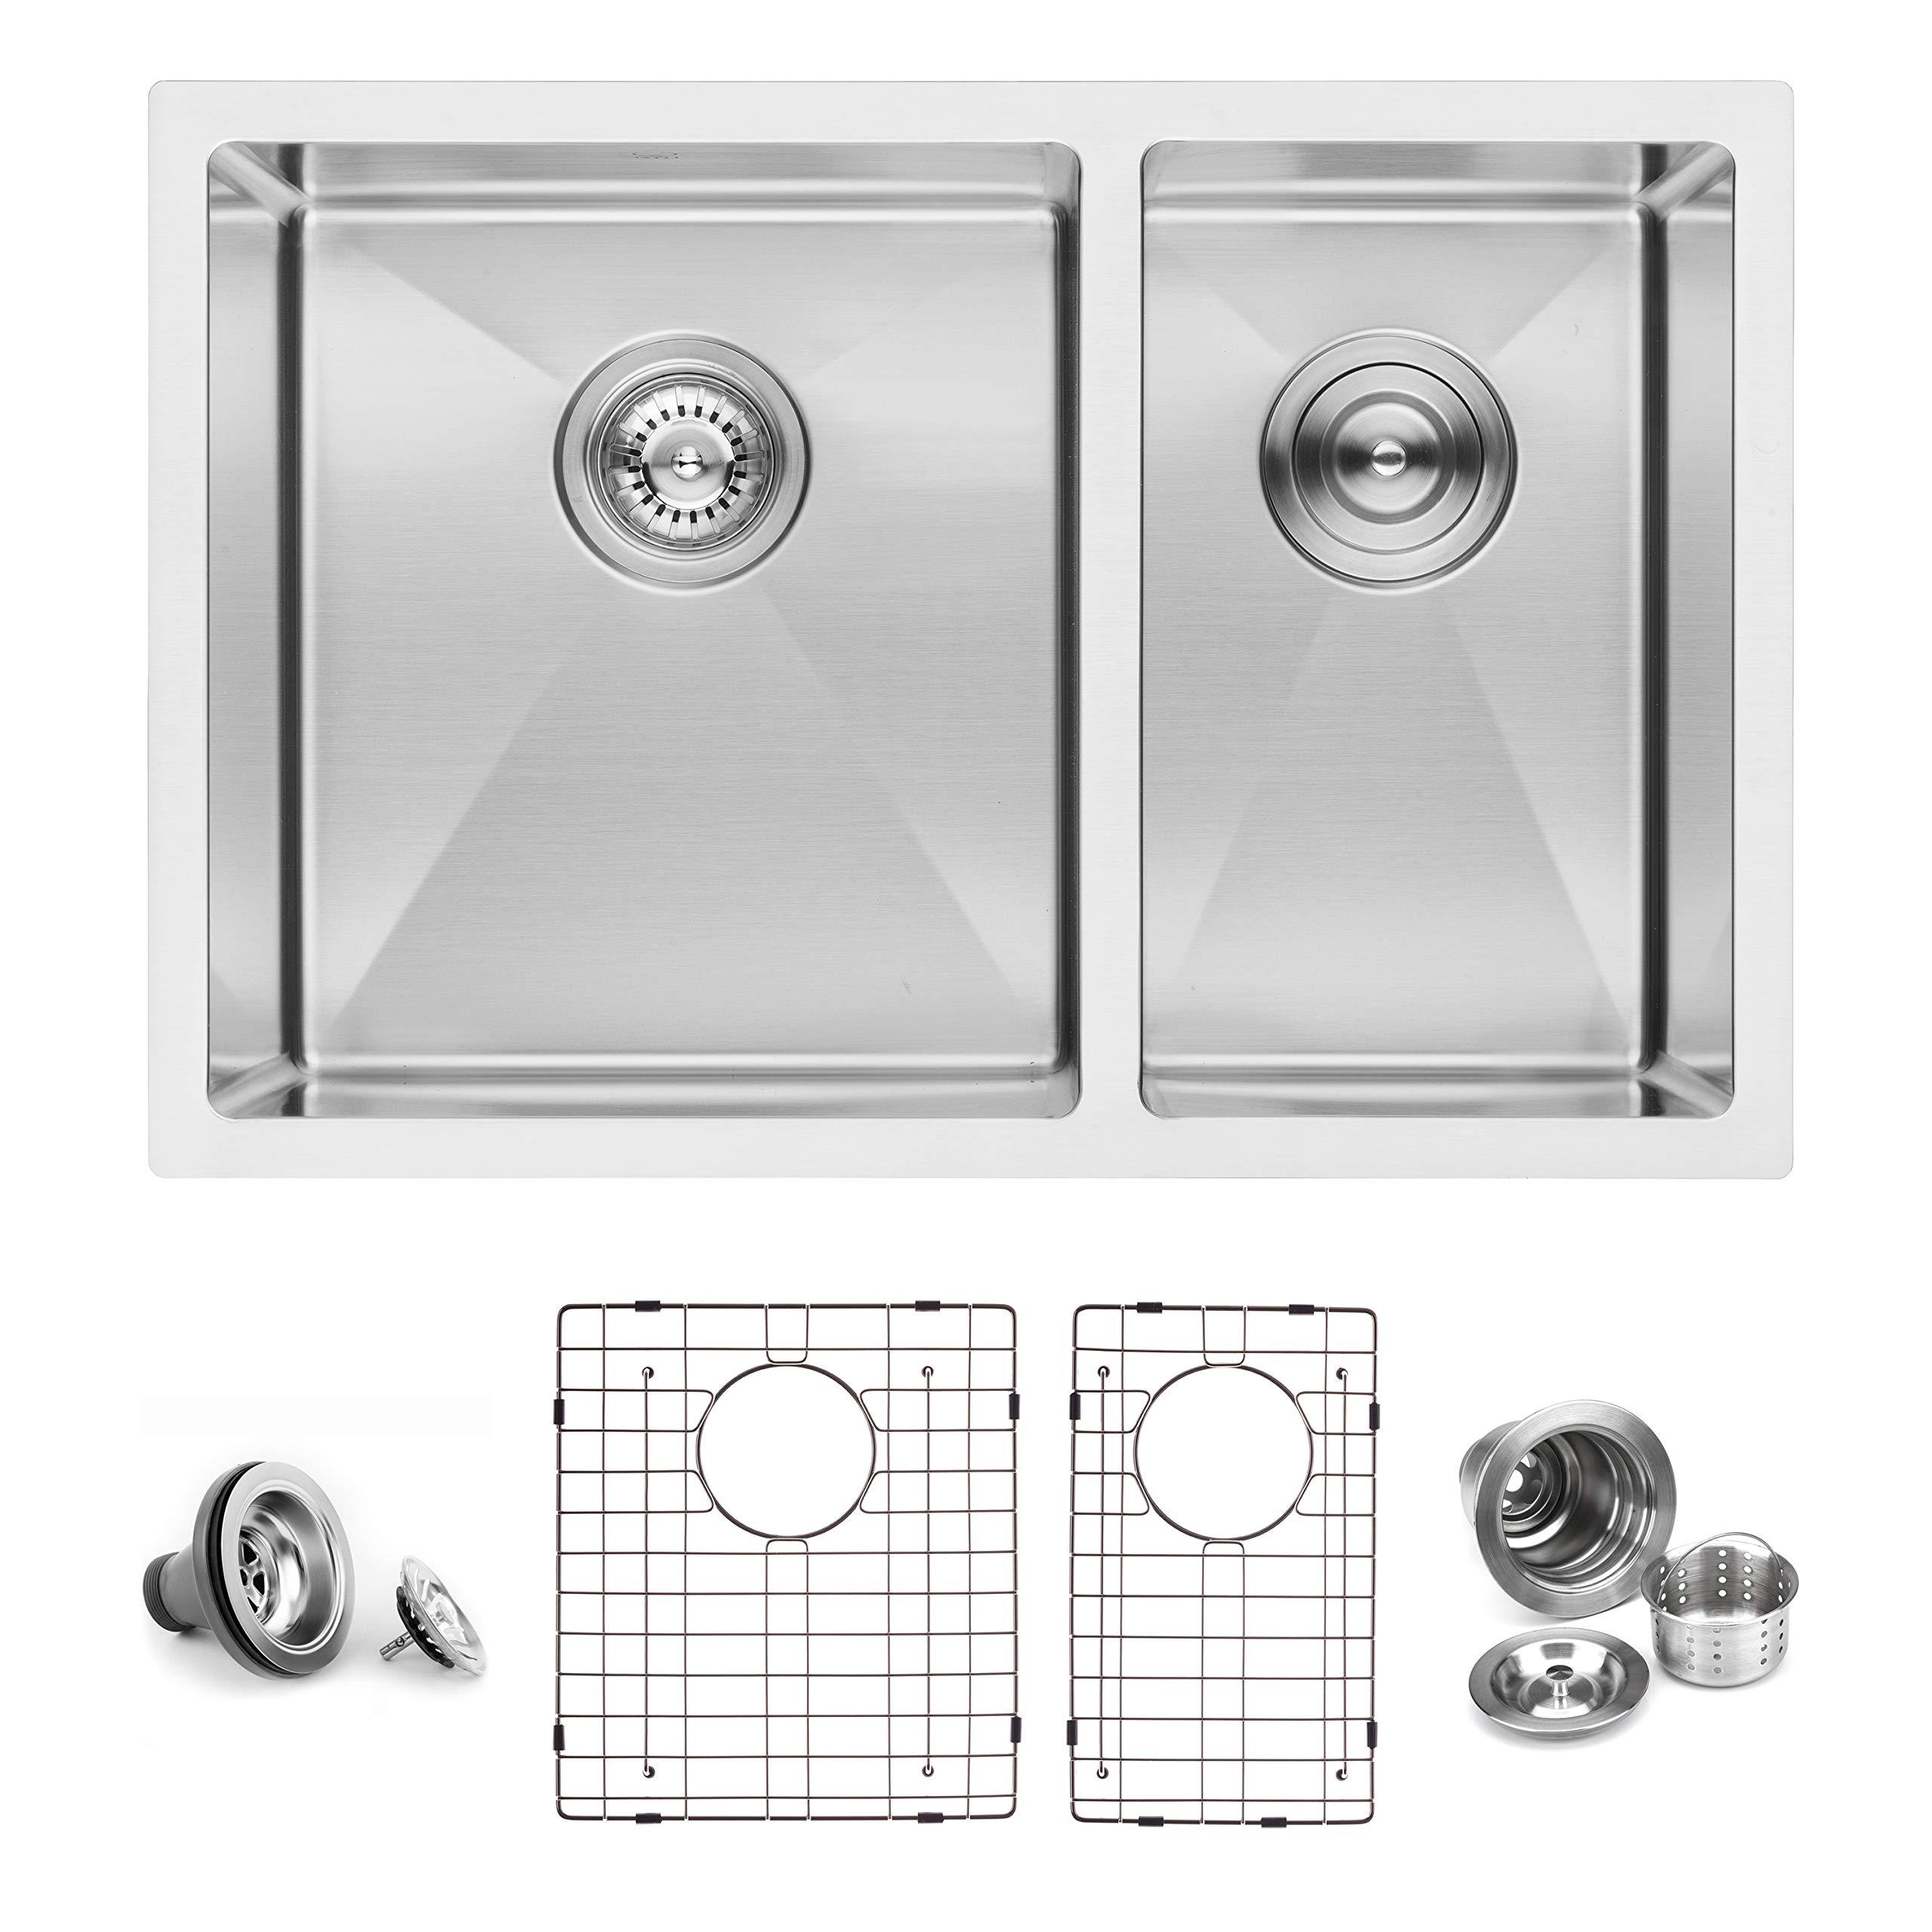 BAI 1227-27'' Handmade Stainless Steel Kitchen Sink Double Bowl Under Mount 16 Gauge